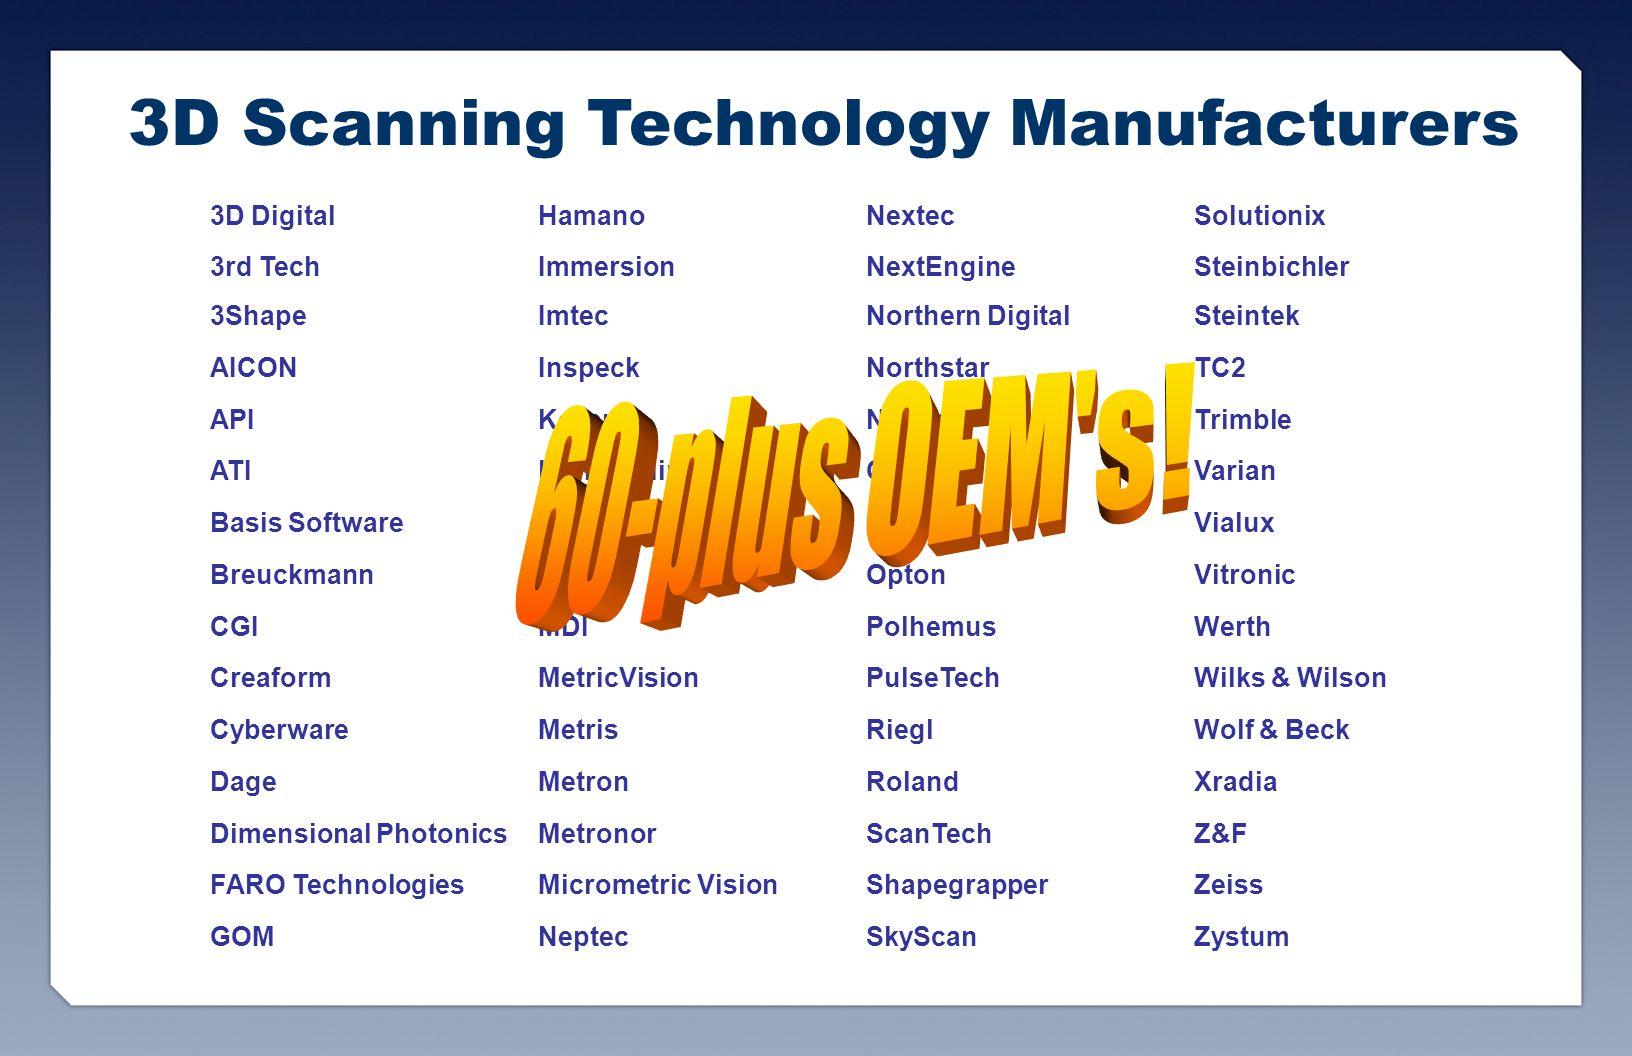 3D Scanning Technology Manufacturers 3D DigitalHamanoNextecSolutionix 3rd TechImmersionNextEngineSteinbichler 3ShapeImtecNorthern DigitalSteintek AICONInspeckNorthstarTC2 APIKeyenceNub3dTrimble ATIKonica MinoltaOptechVarian Basis SoftwareLaser DesignOptimetVialux BreuckmannLeicaOptonVitronic CGIMDIPolhemusWerth CreaformMetricVisionPulseTechWilks & Wilson CyberwareMetrisRieglWolf & Beck DageMetronRolandXradia Dimensional PhotonicsMetronorScanTechZ&F FARO TechnologiesMicrometric VisionShapegrapperZeiss GOMNeptecSkyScanZystum